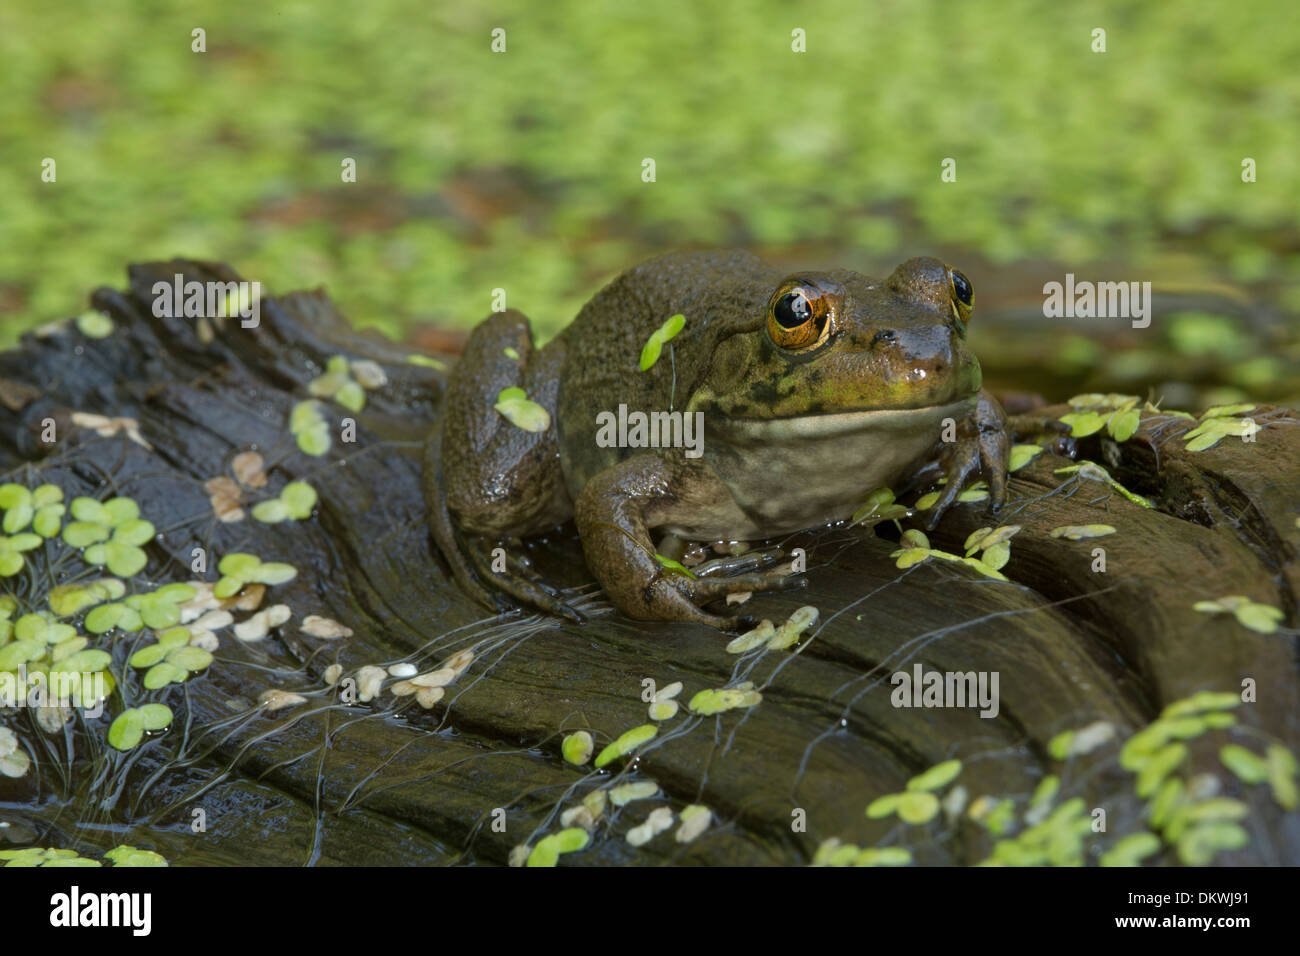 (Lithobates catesbeianus grenouille taureau américain), Rana catesbeiana Banque D'Images